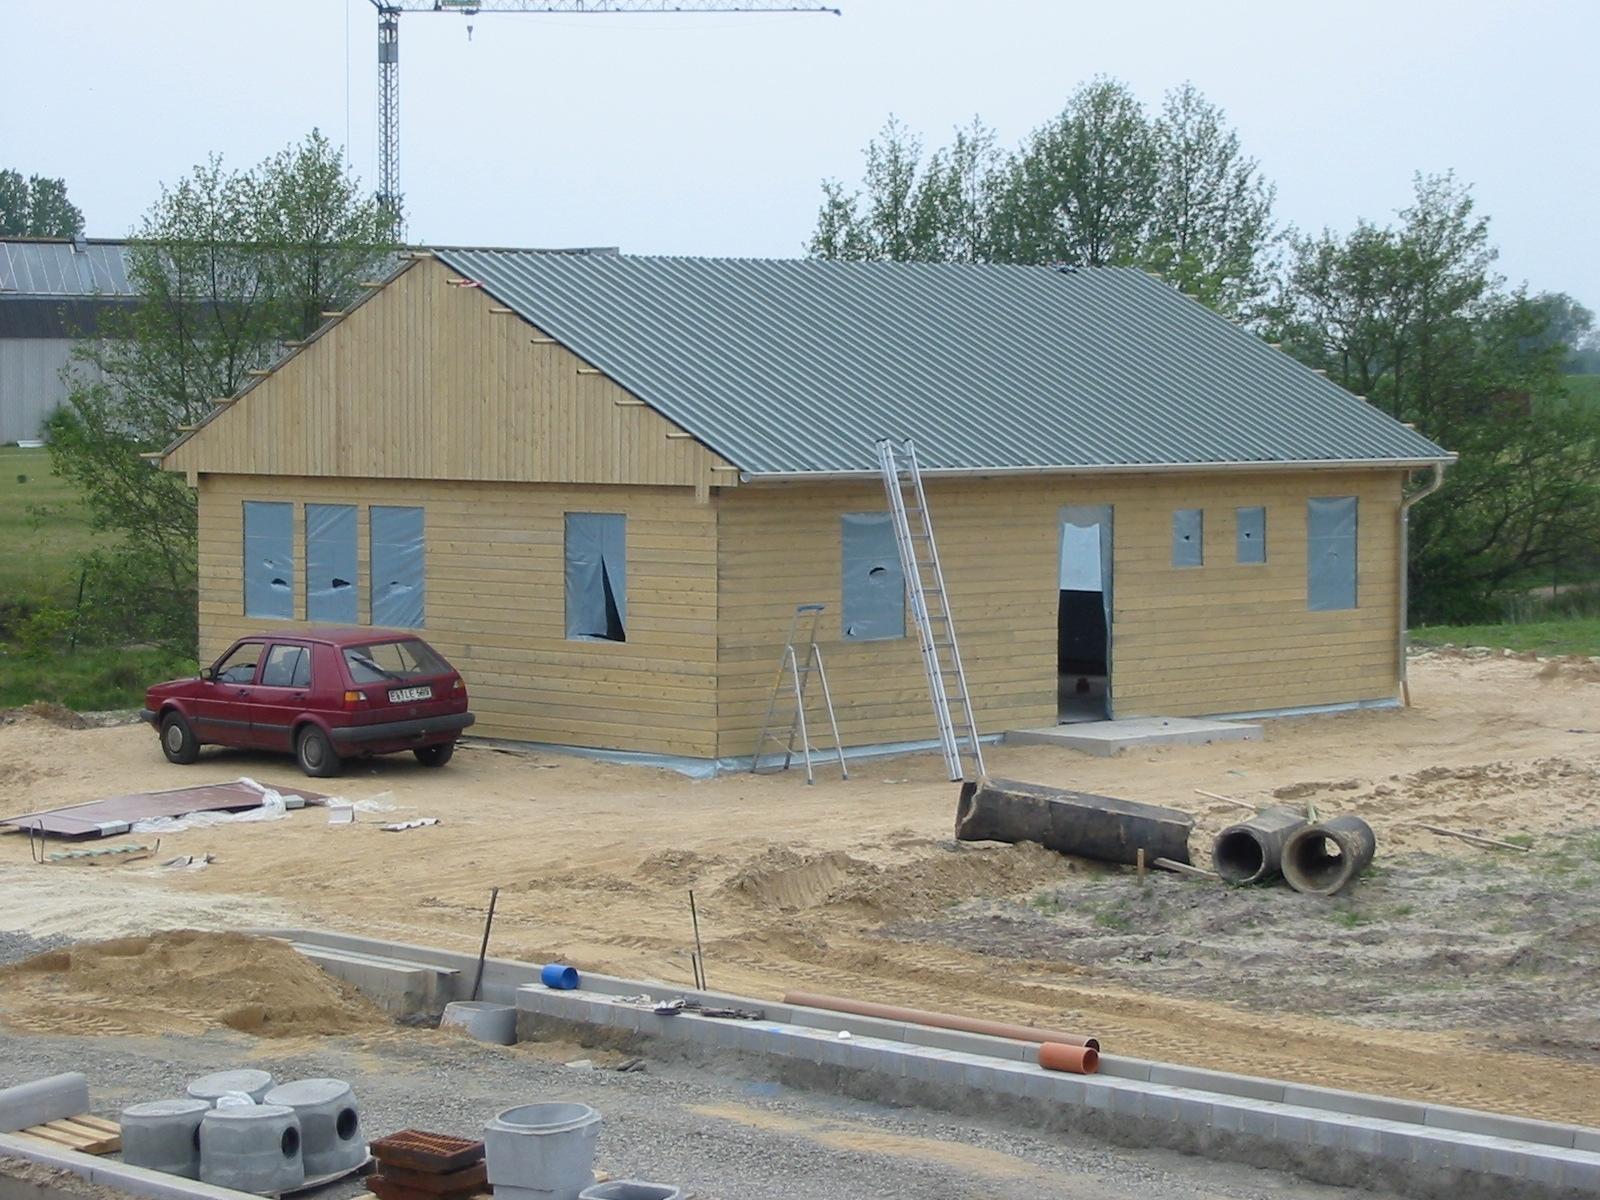 2018-08-22-vereinsheim26